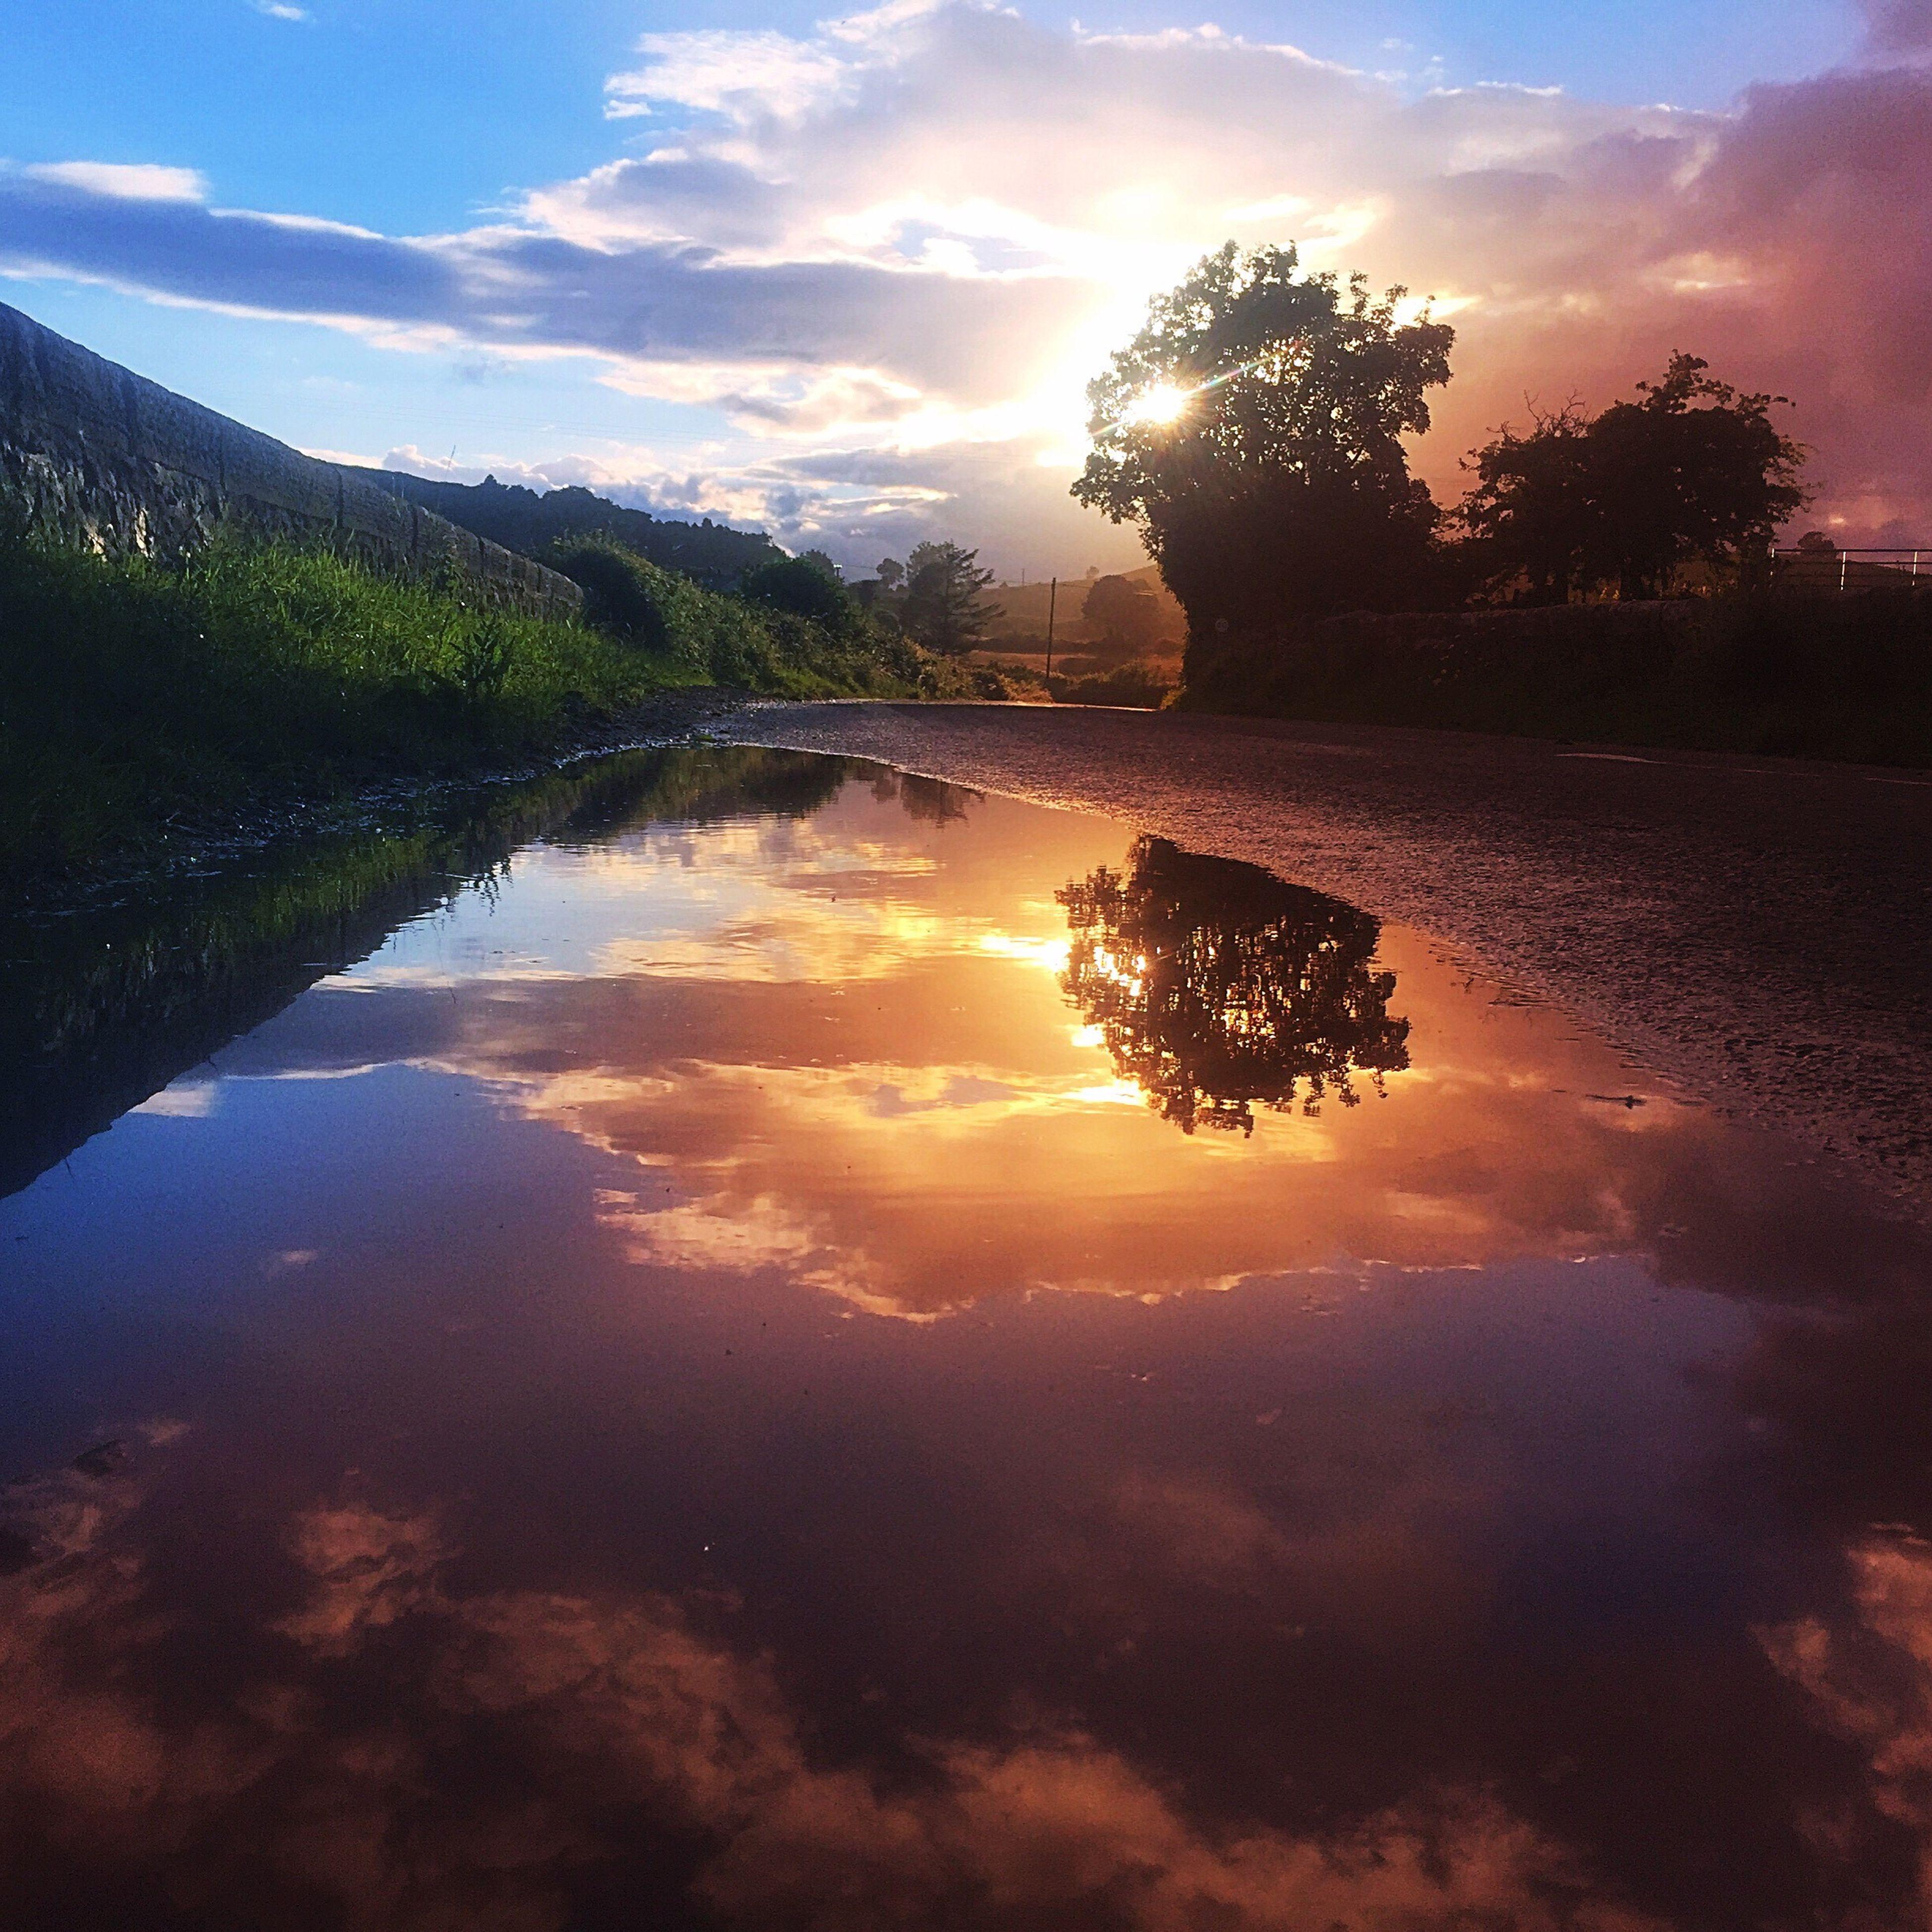 sunset, reflection, sky, water, nature, cloud - sky, tree, beauty in nature, sun, scenics, sunlight, idyllic, vacations, lake, sunbeam, silhouette, outdoors, landscape, reflection lake, no people, day